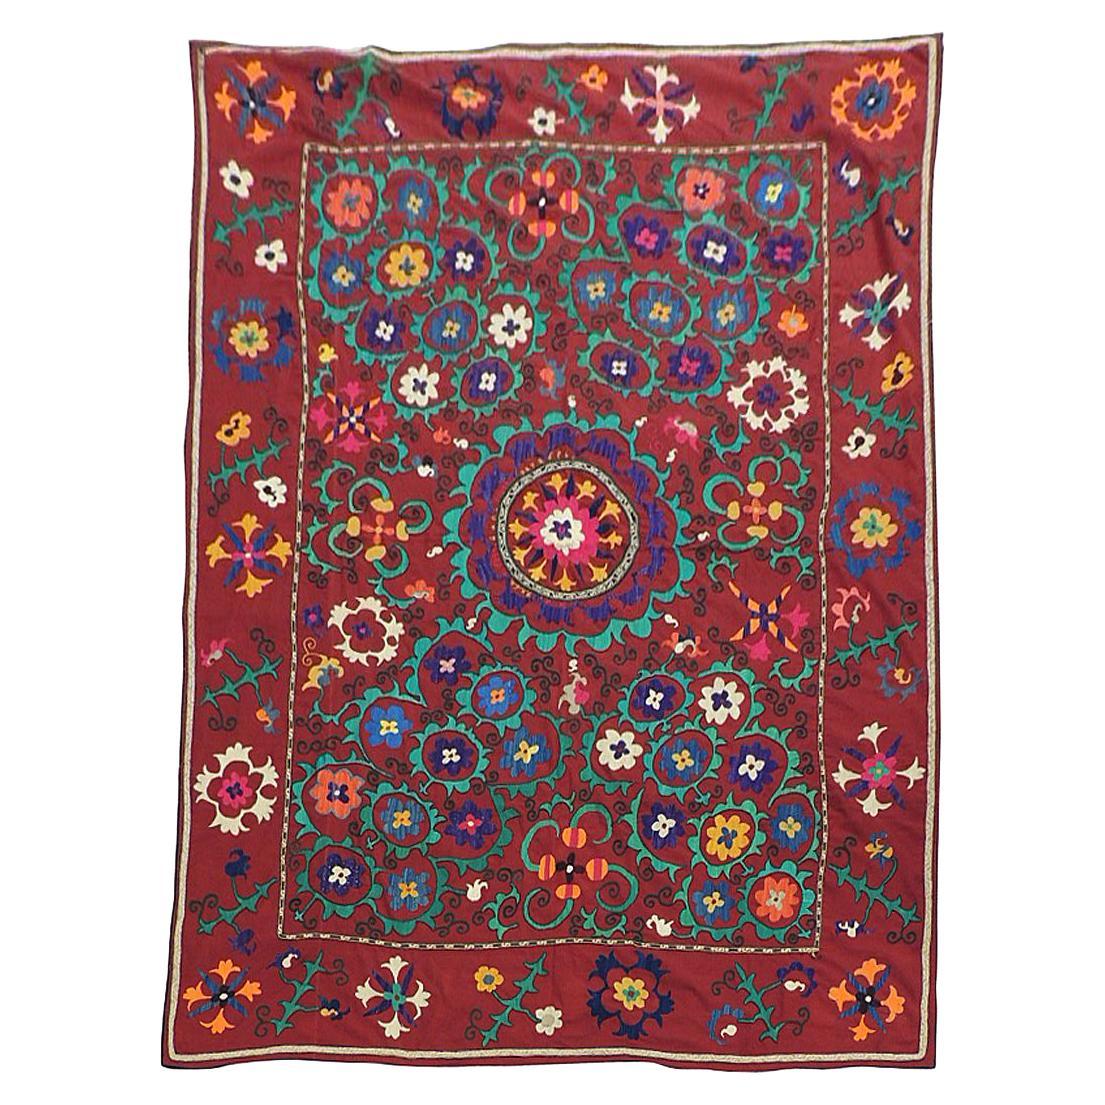 Vintage Large Red and Orange Floral Suzani Textile Panel